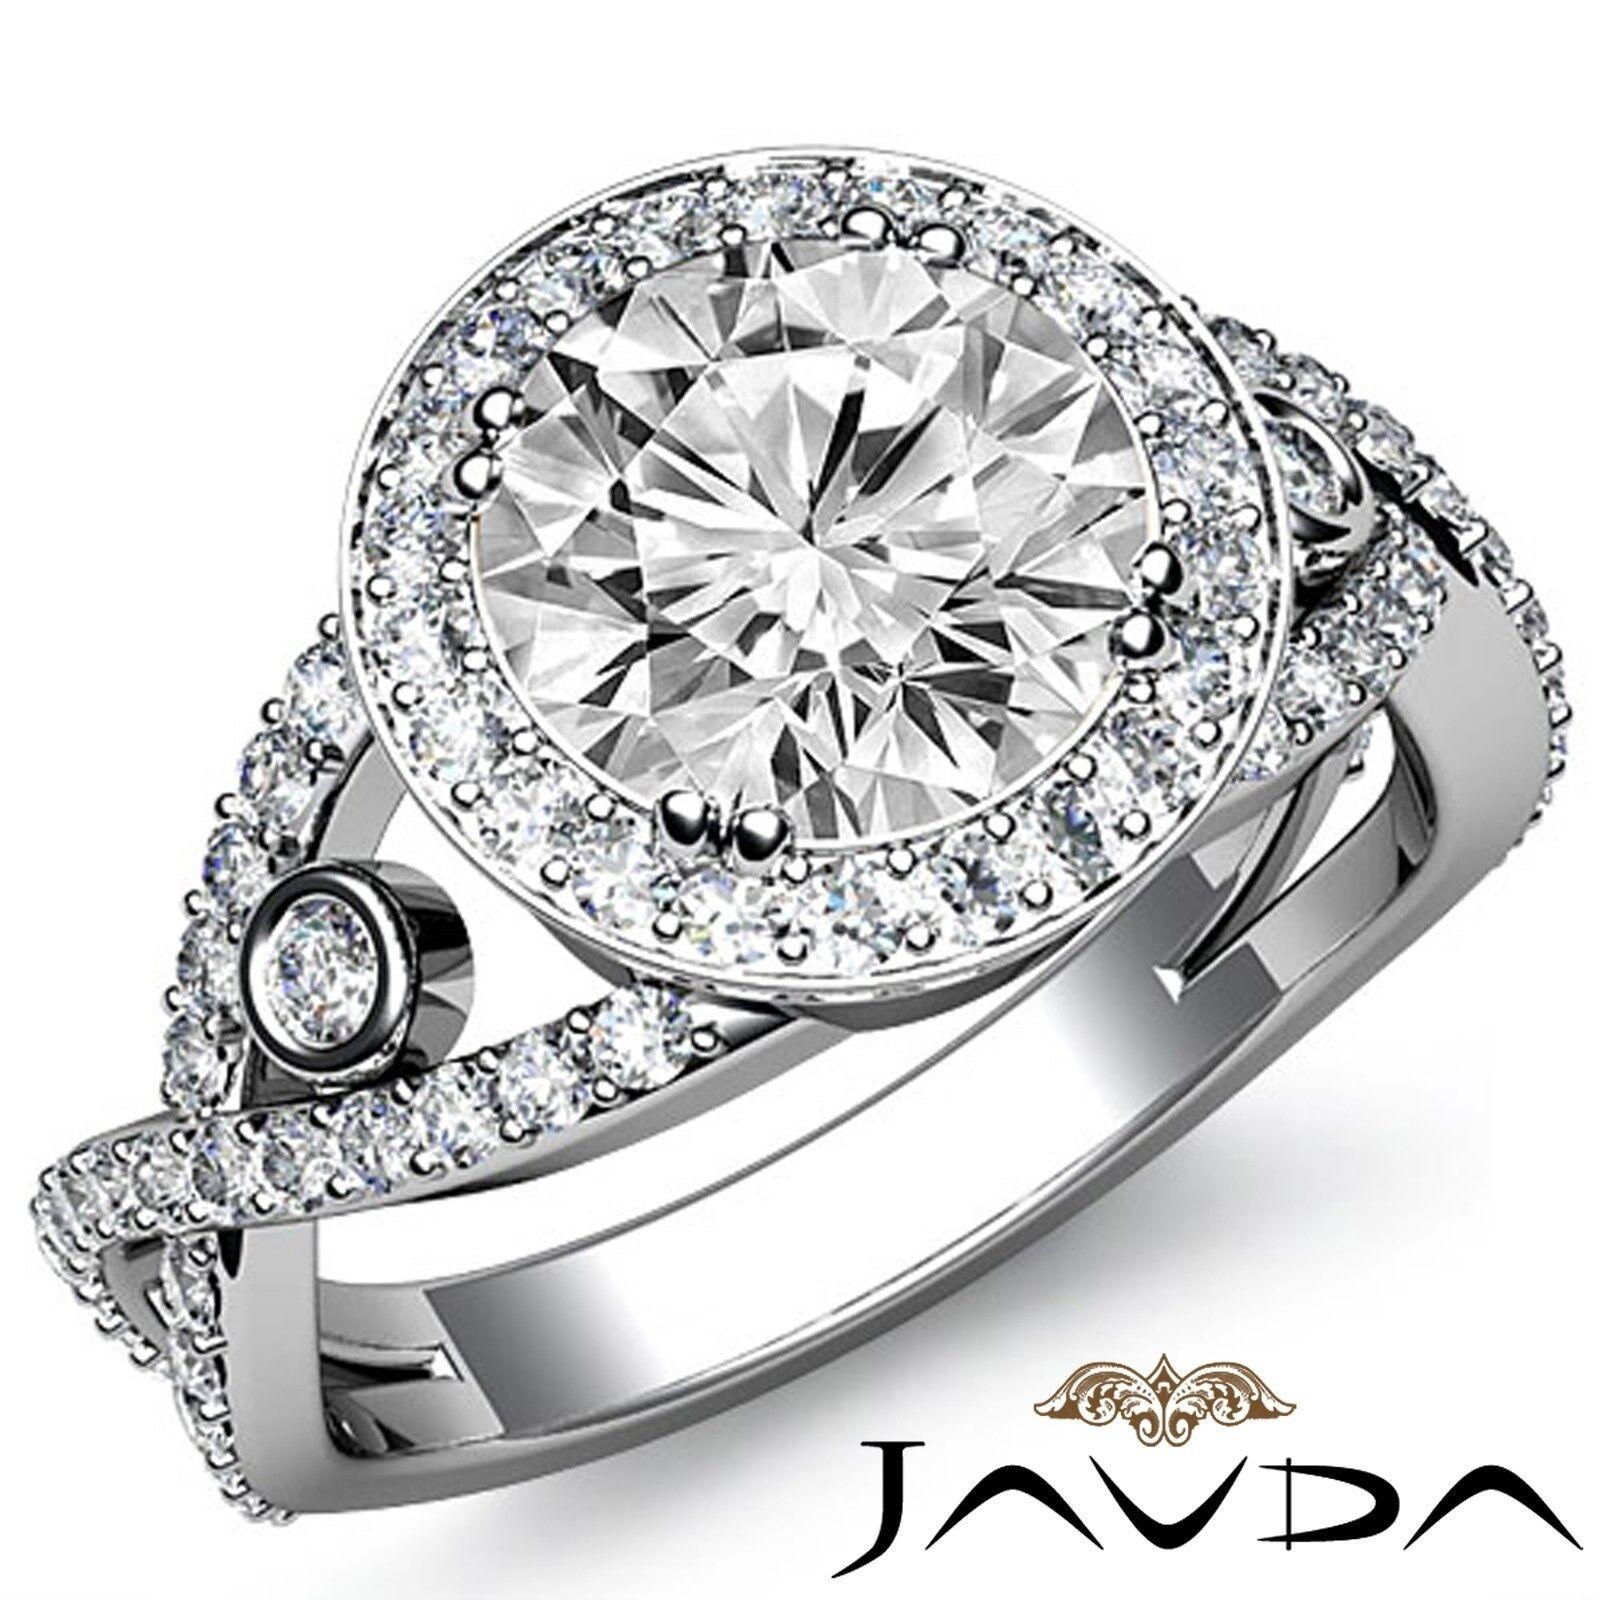 4.4ct Cross Shank Bezel Pave Halo Round Diamond Engagement Ring GIA I-SI1 W Gold